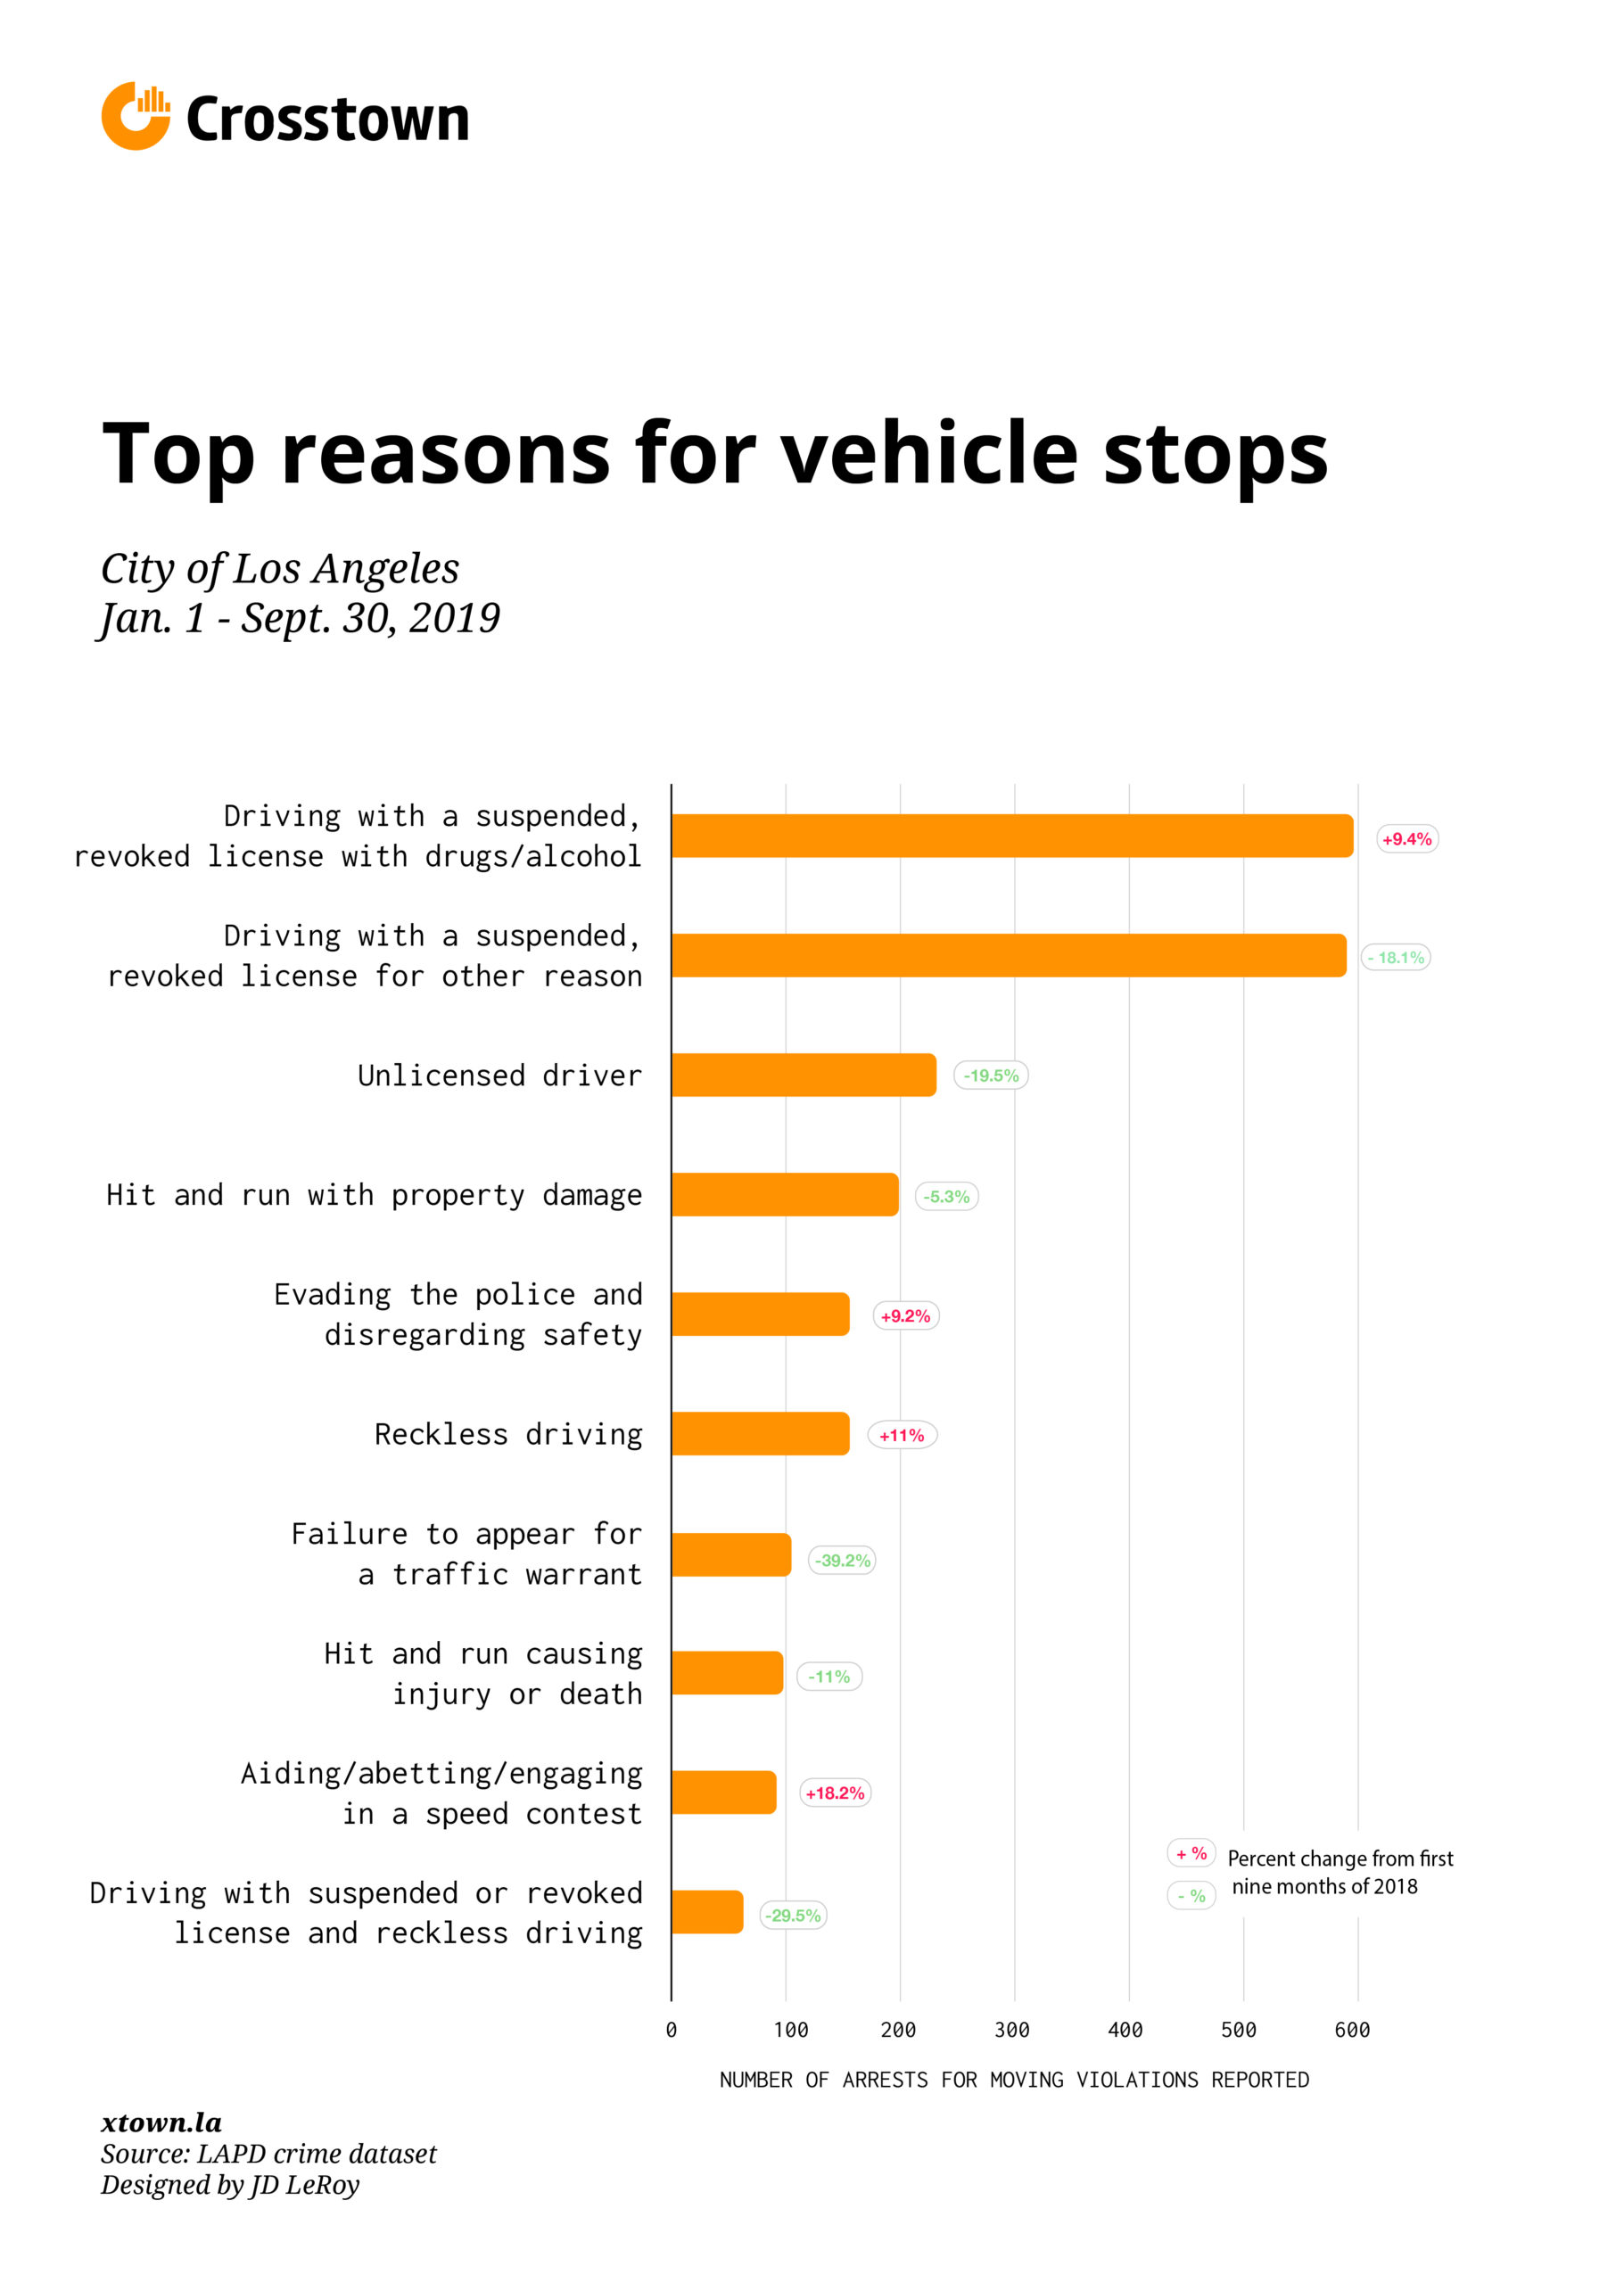 top reasons for vehicle stops bar graph